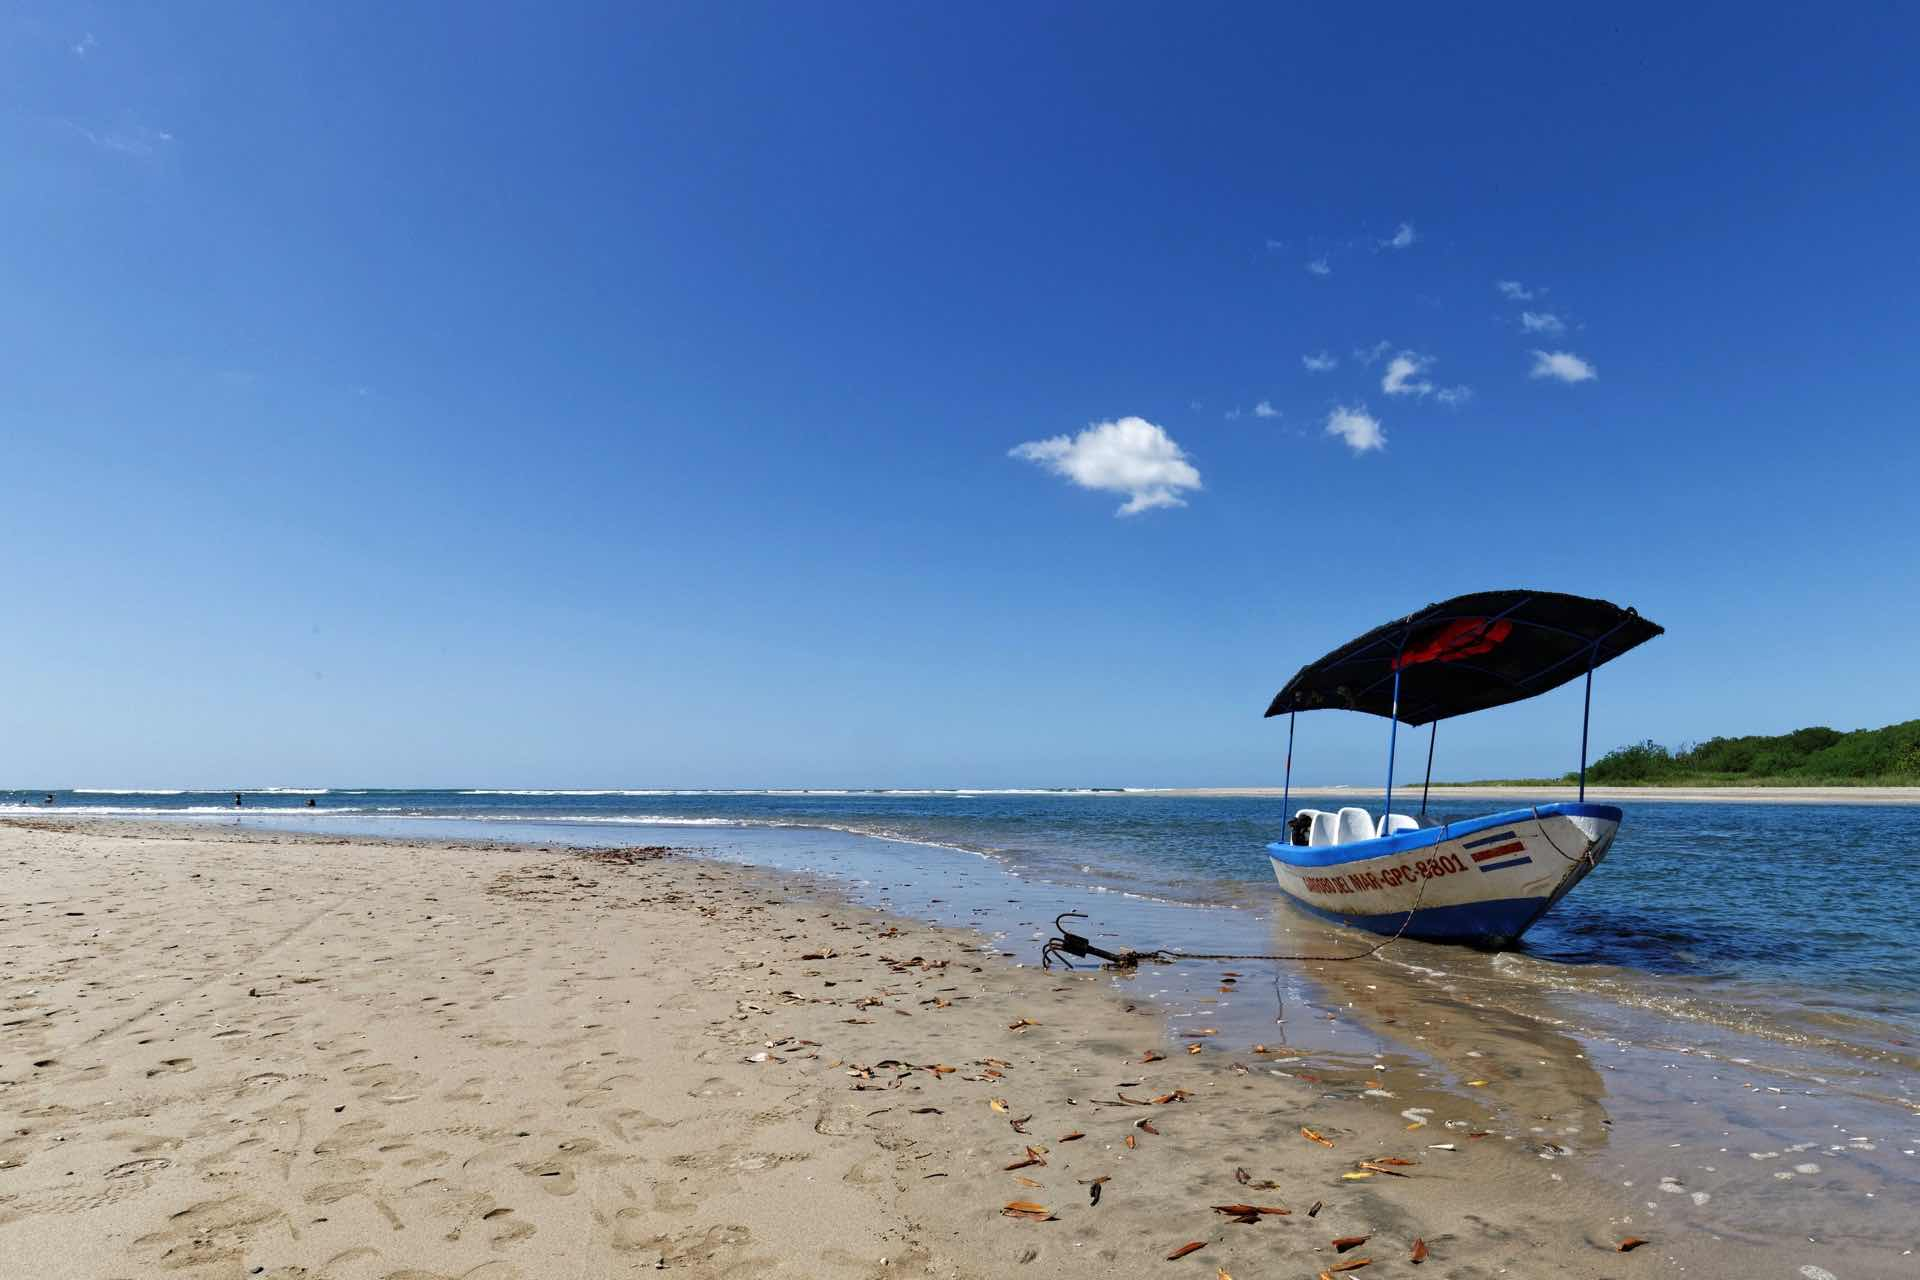 Panga boat waiting in the Tamarindo estuary